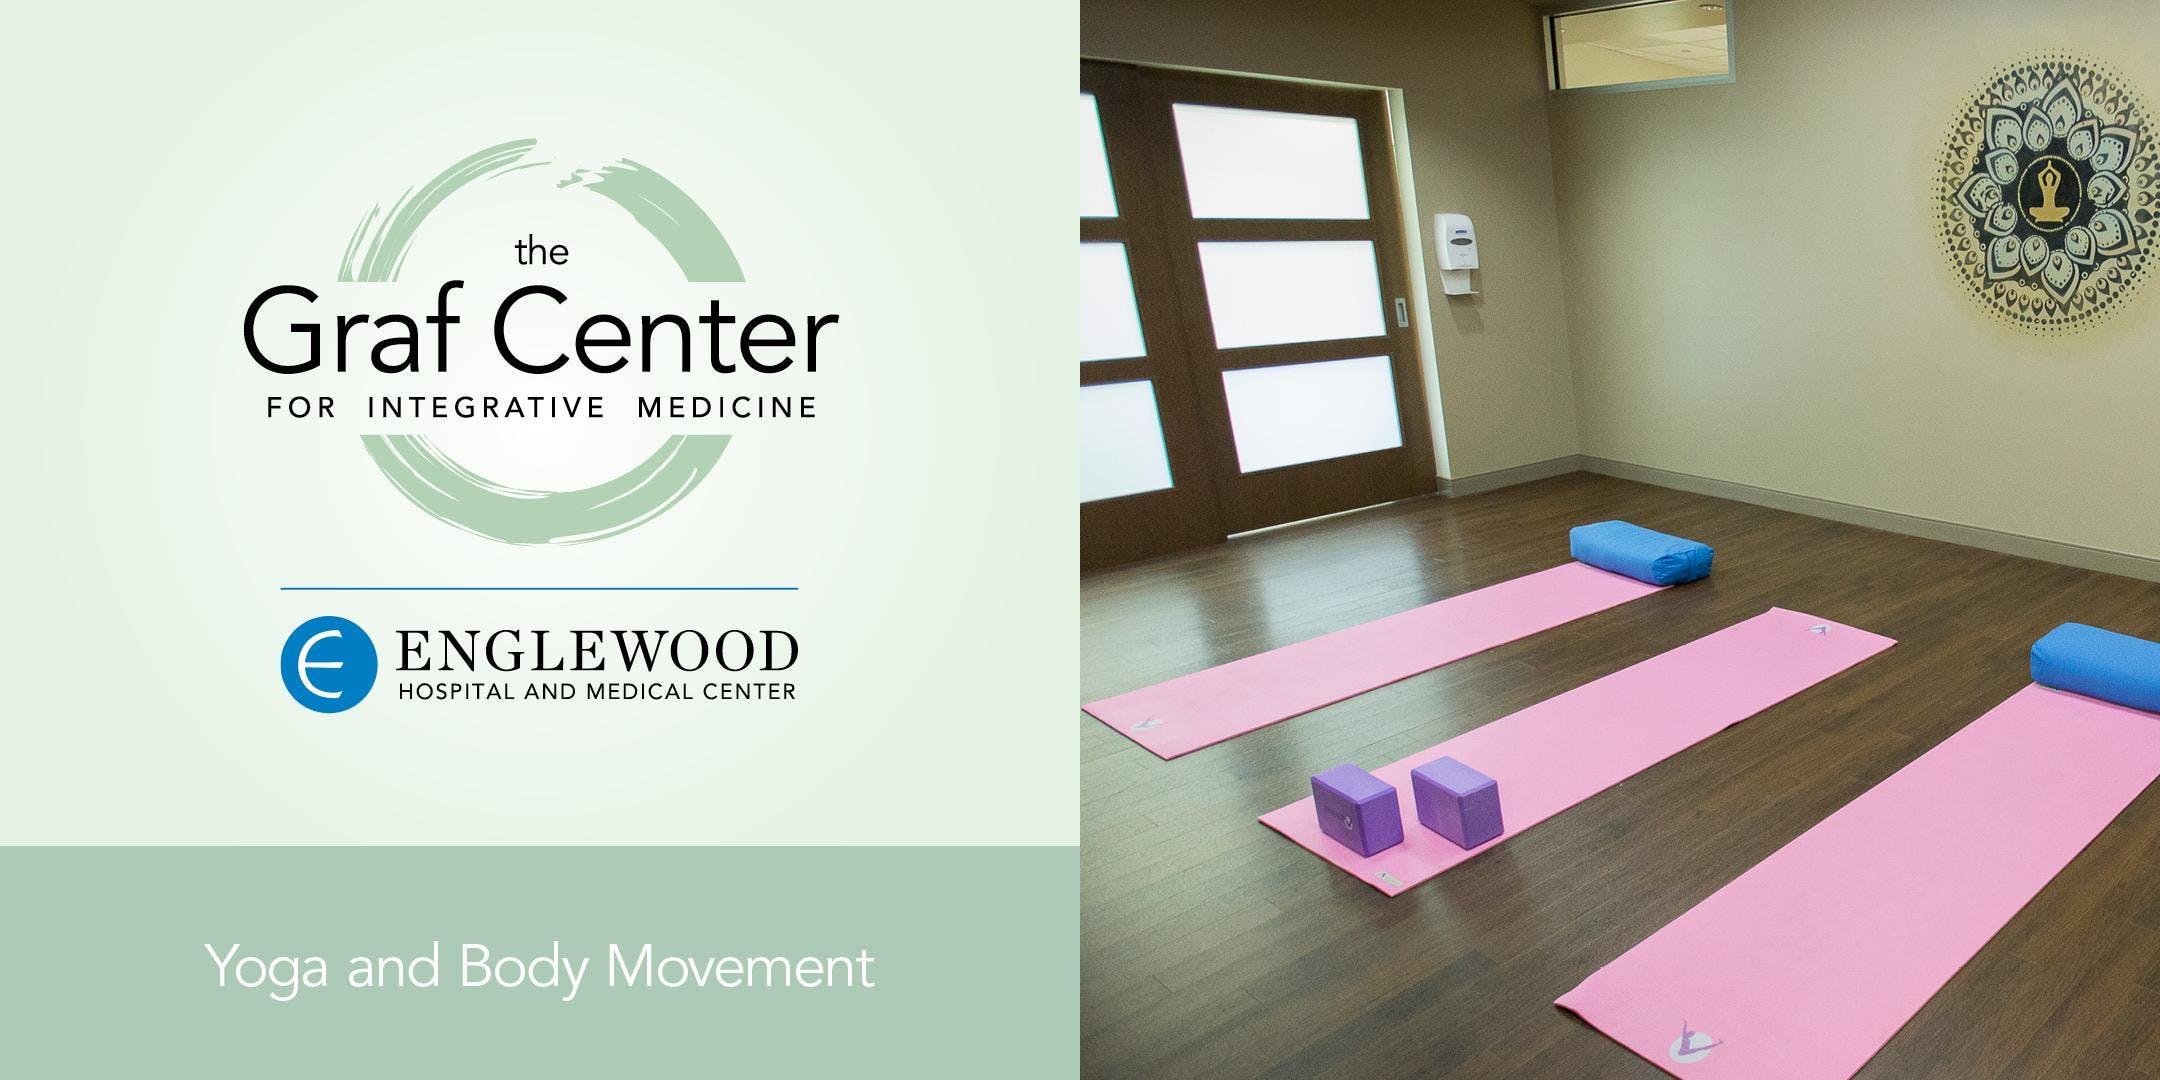 More info: Gentle Yoga - Wednesday Evenings